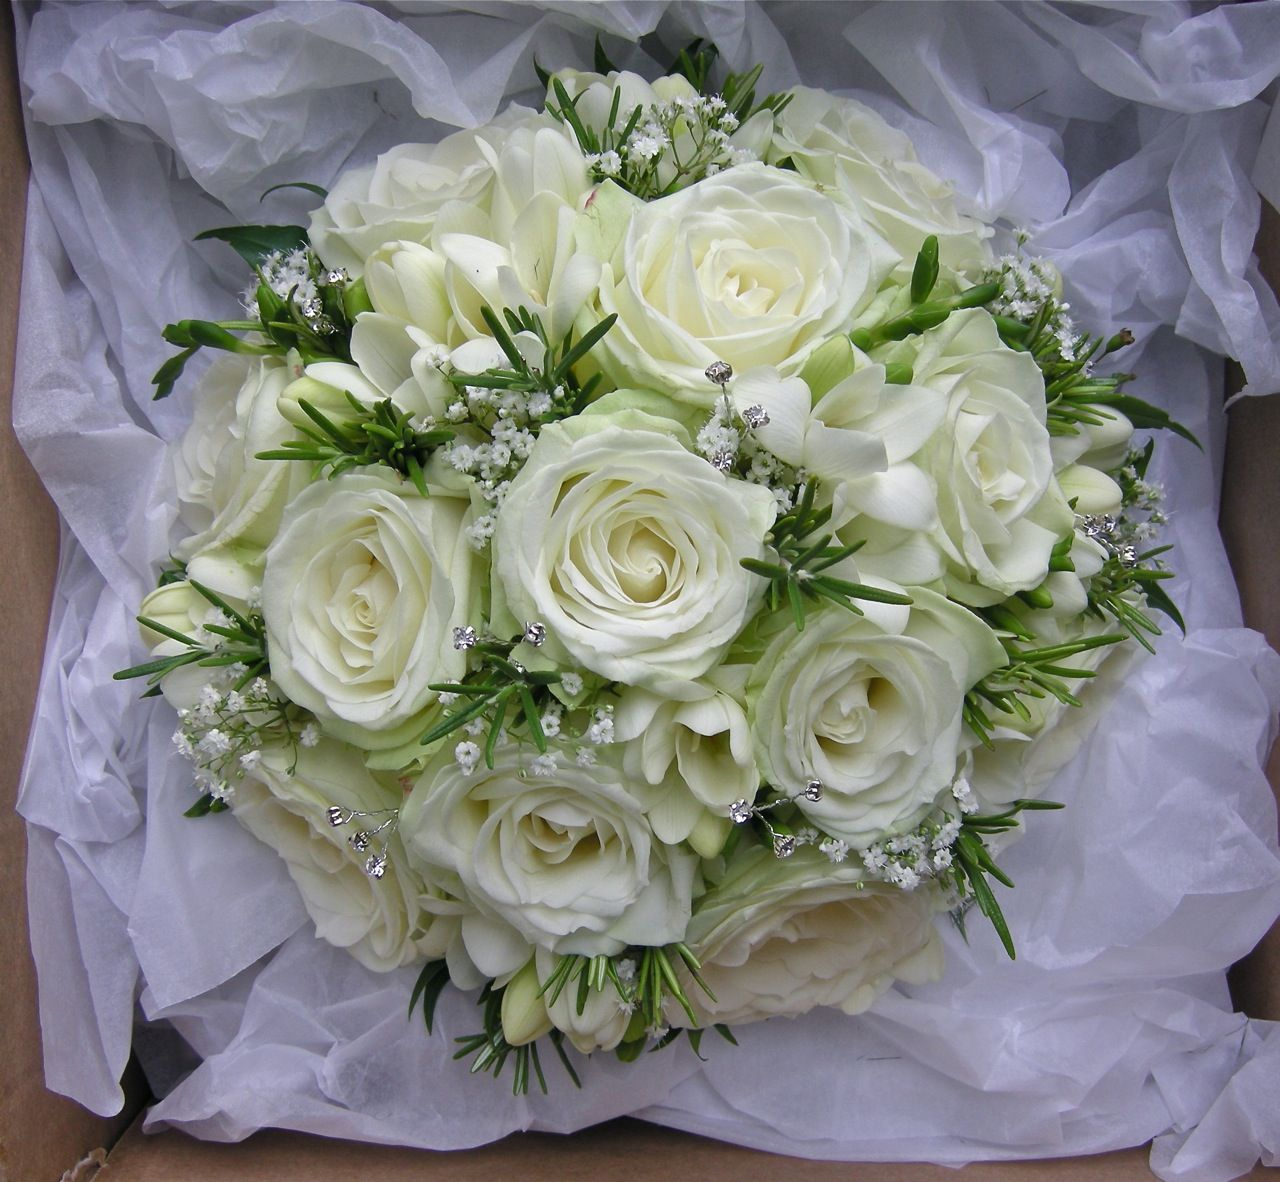 Wedding Bouquet Of Roses,freesias